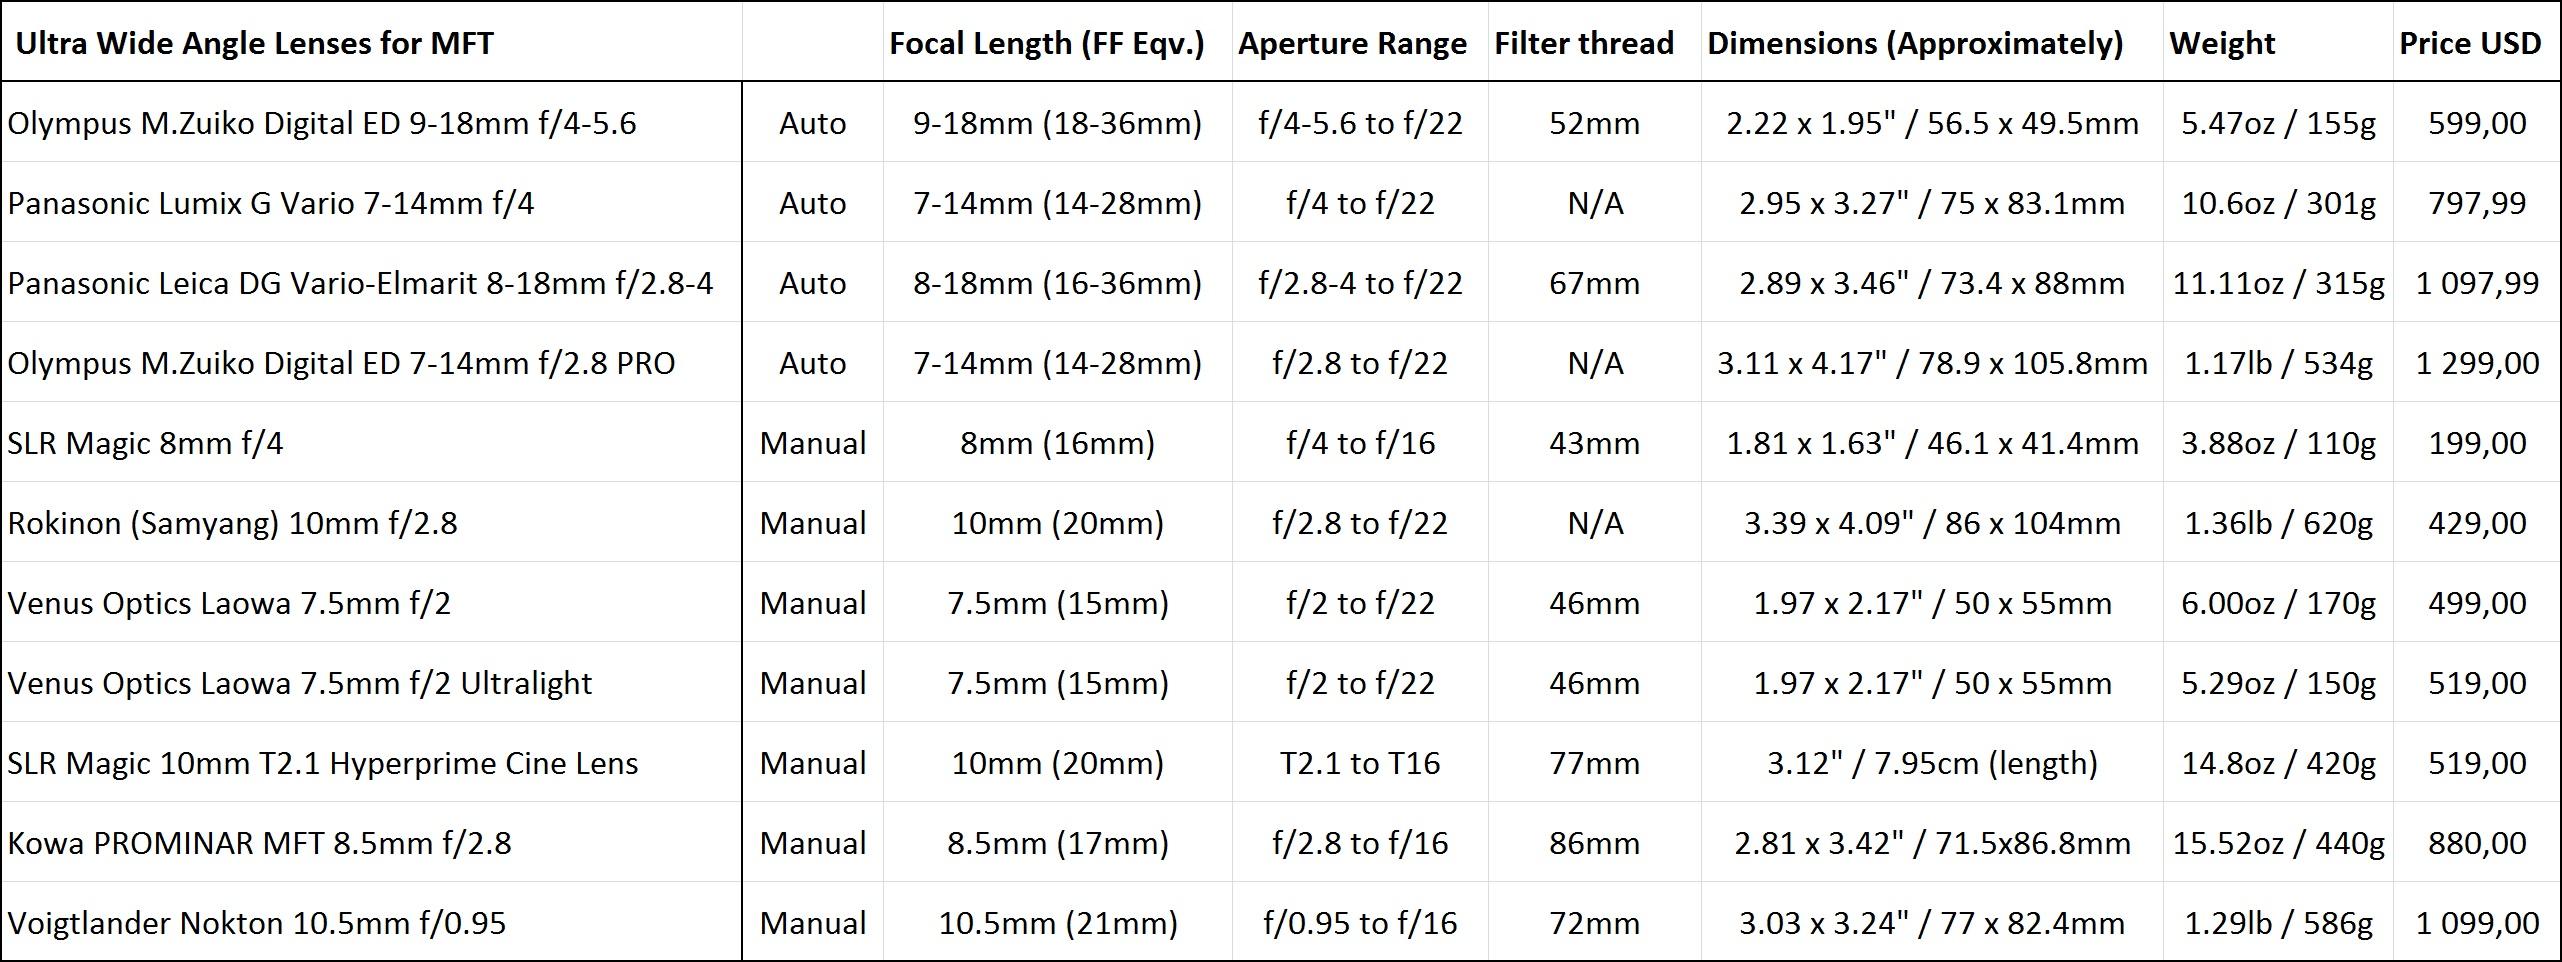 Native Ultra Wide-Angle Lenses for MFT - Buyer's Guide | cinema5D